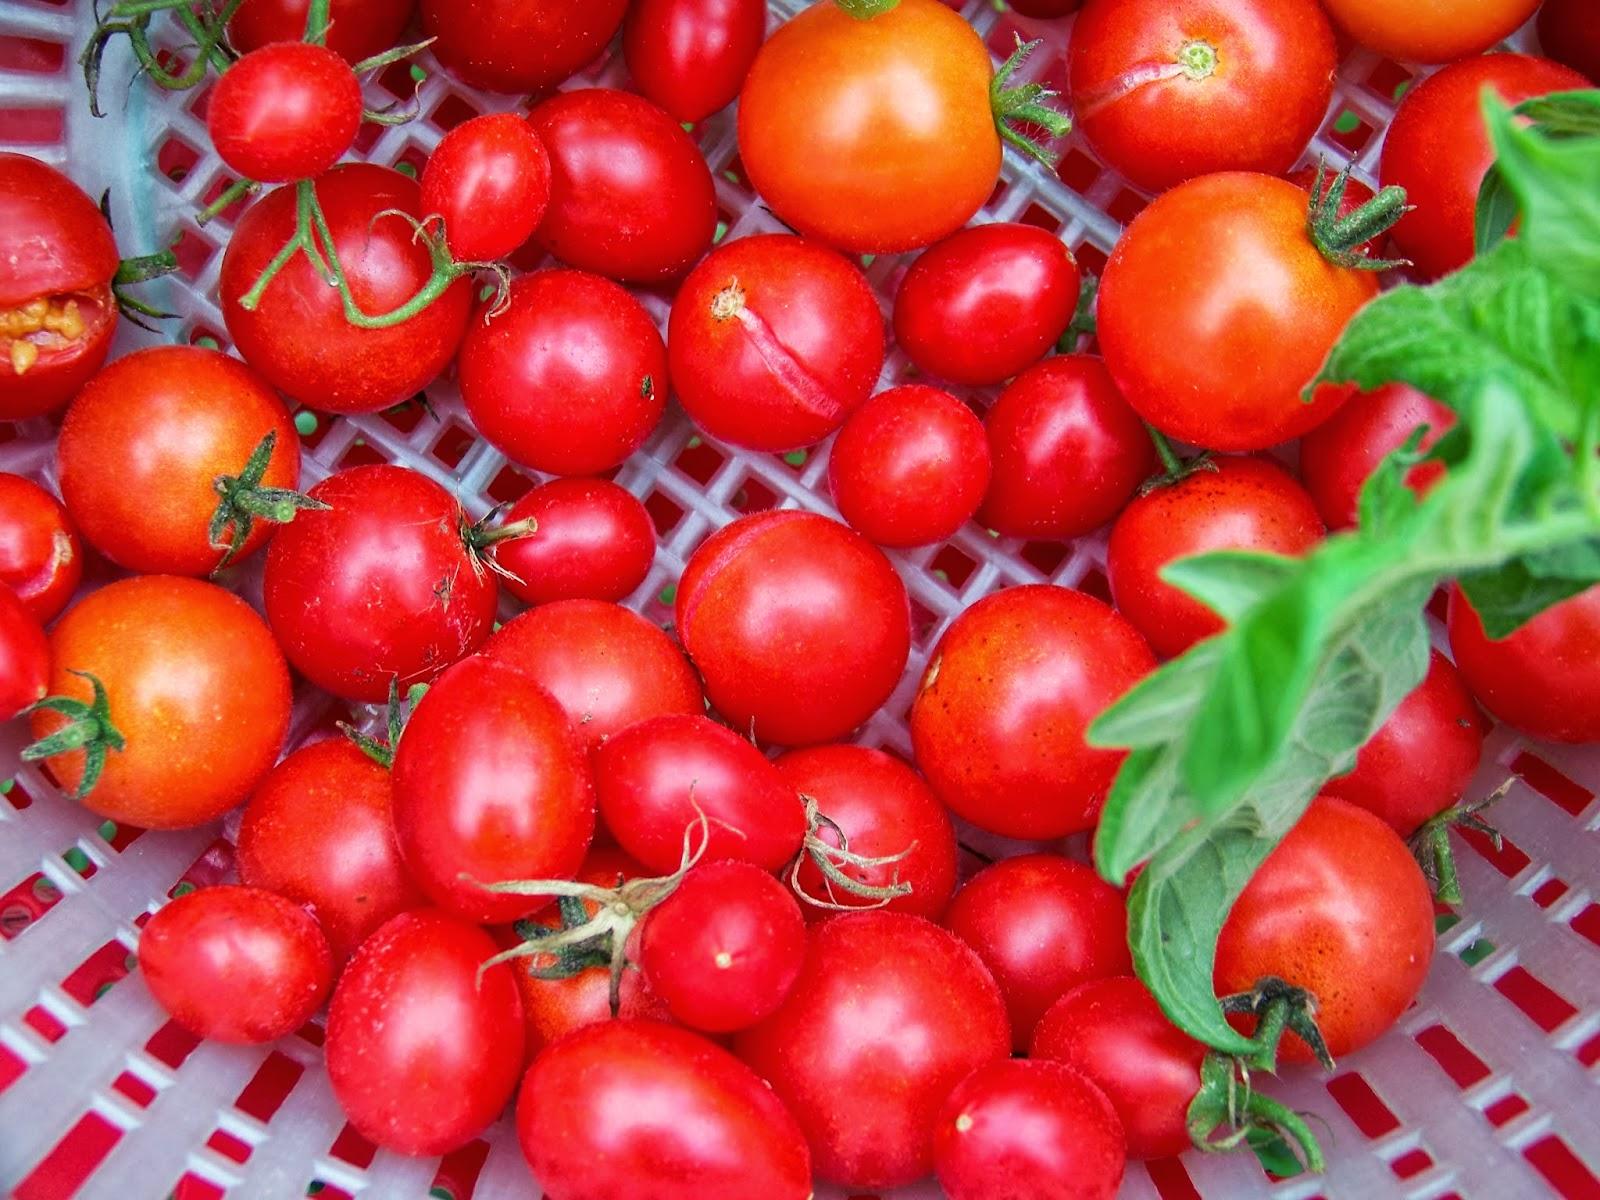 Husky Hybrid Red Tomato Cherry